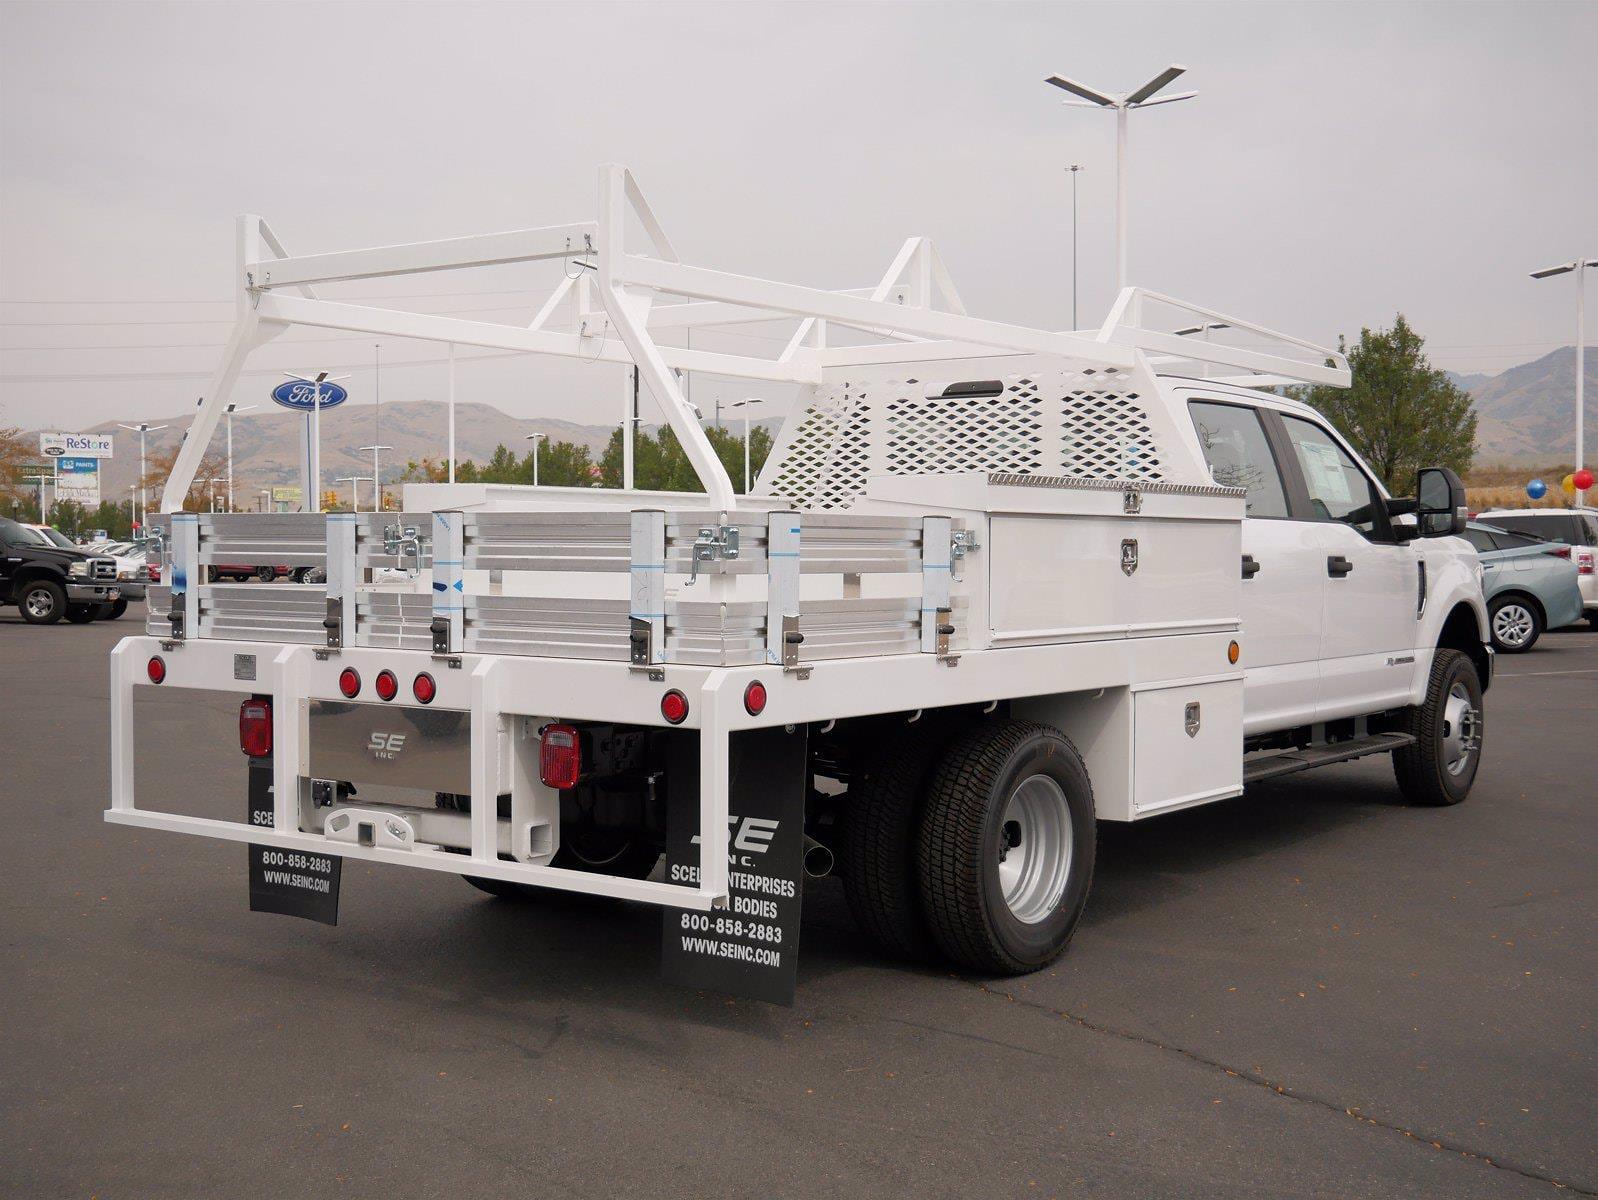 2020 Ford F-350 Crew Cab DRW 4x4, Scelzi Contractor Body #63220 - photo 1